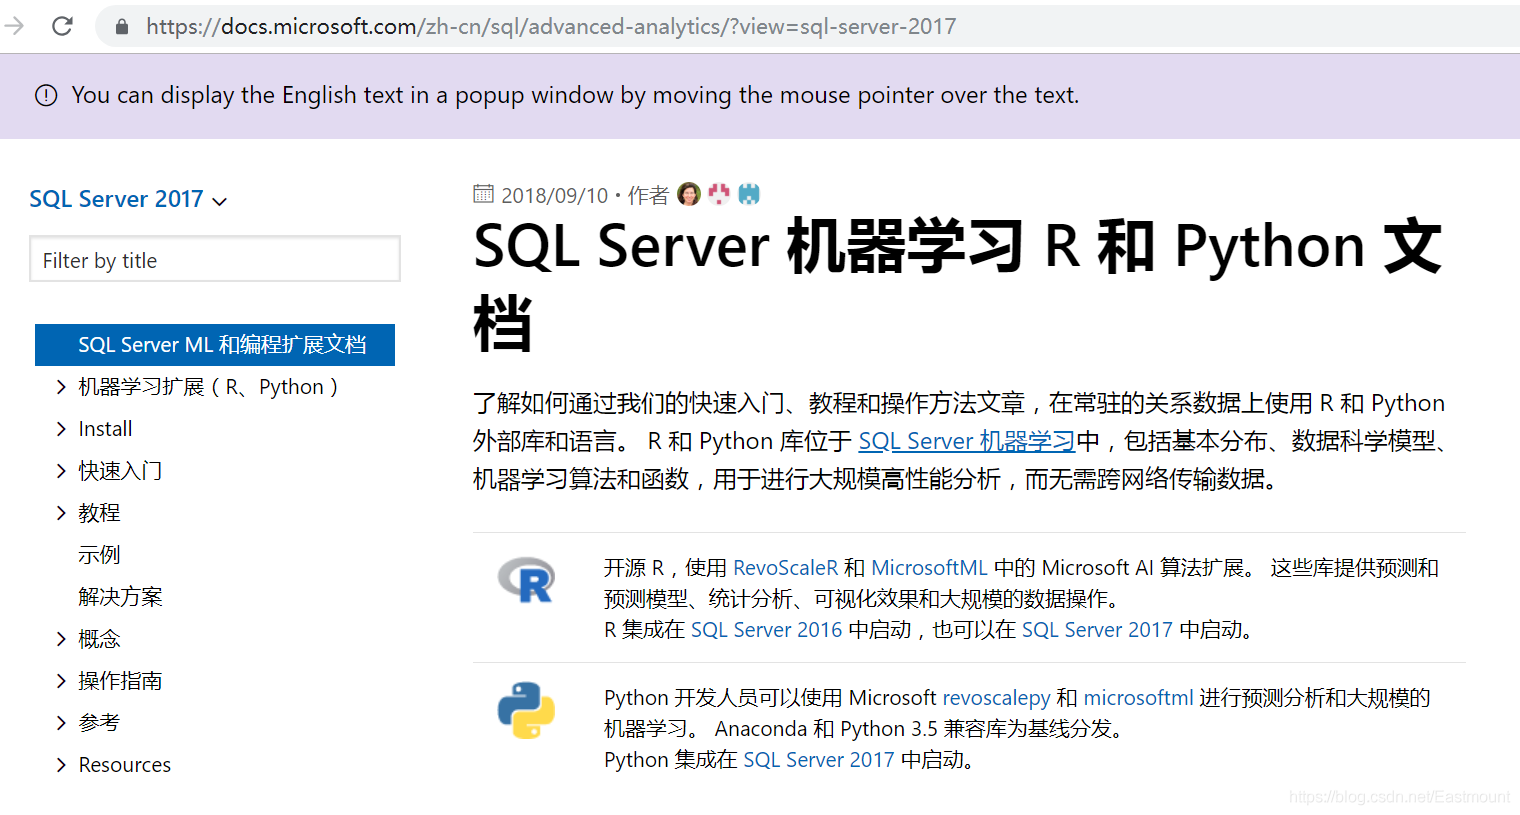 SQL Server玩转Python] 二 T-SQL查询表格值及Python实现数据分析